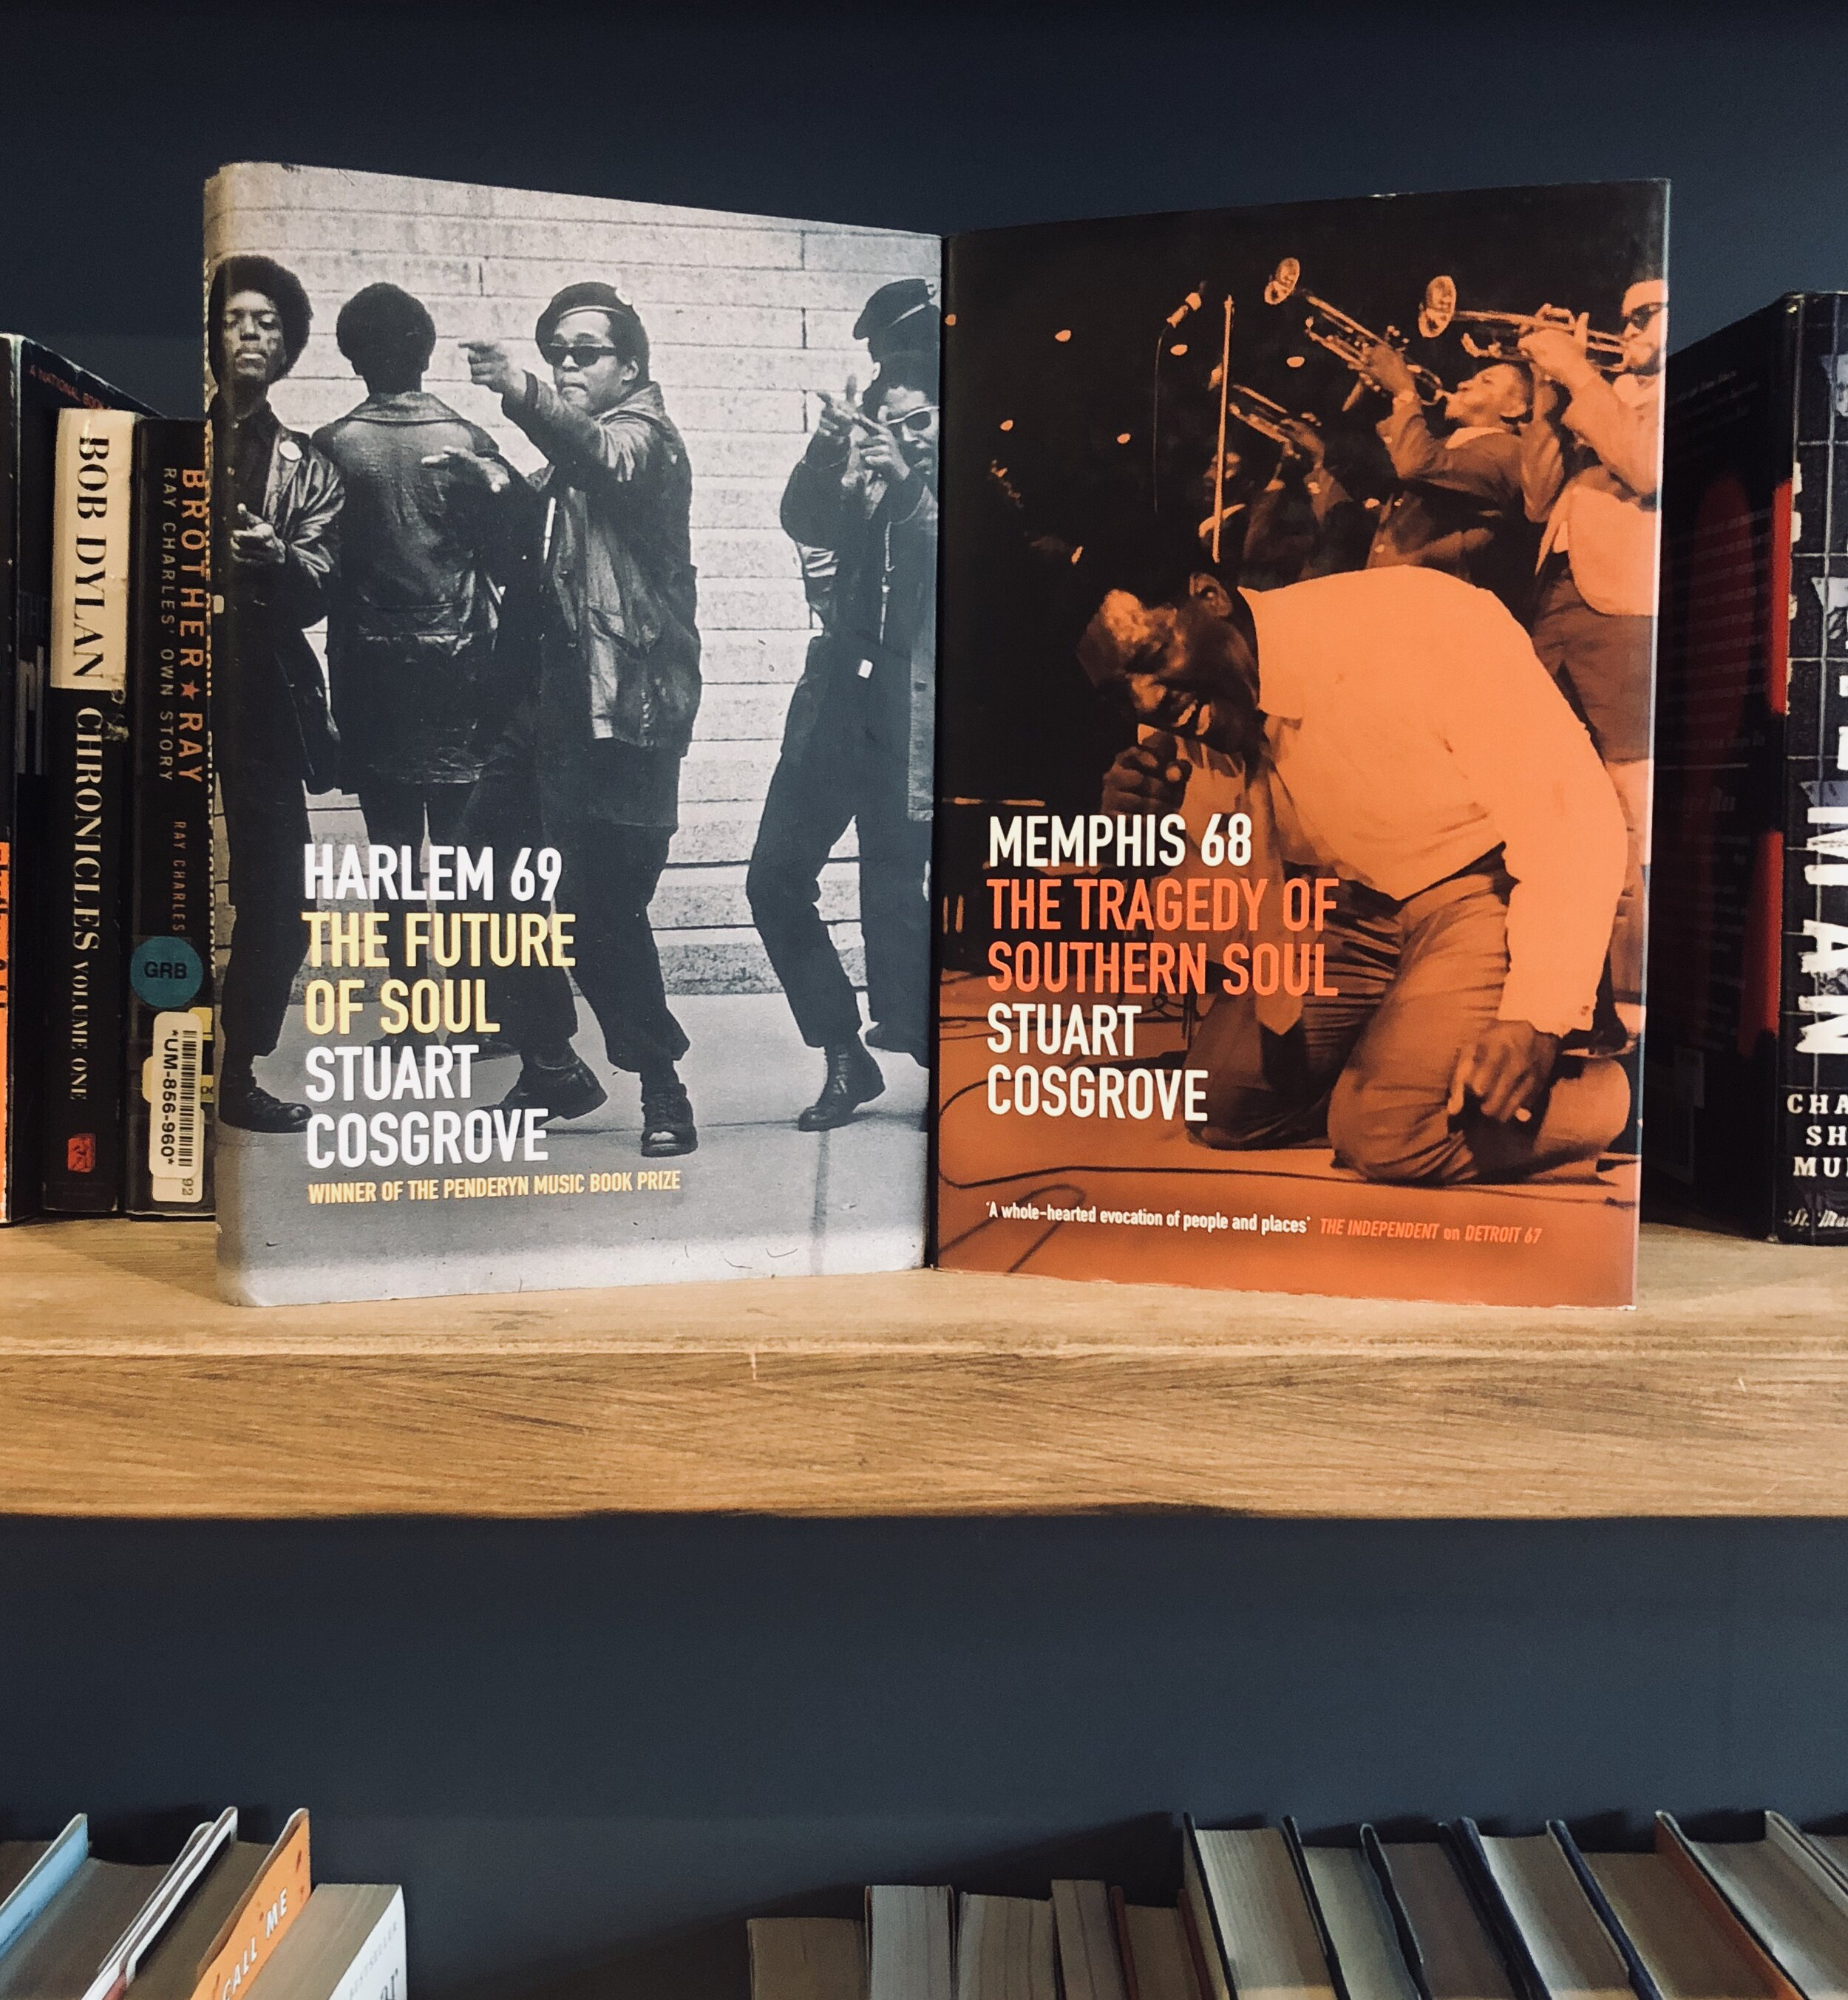 #ArtformBooks:Stuart Cosgrove'sEpic Trilogy of '60s Soul Music -